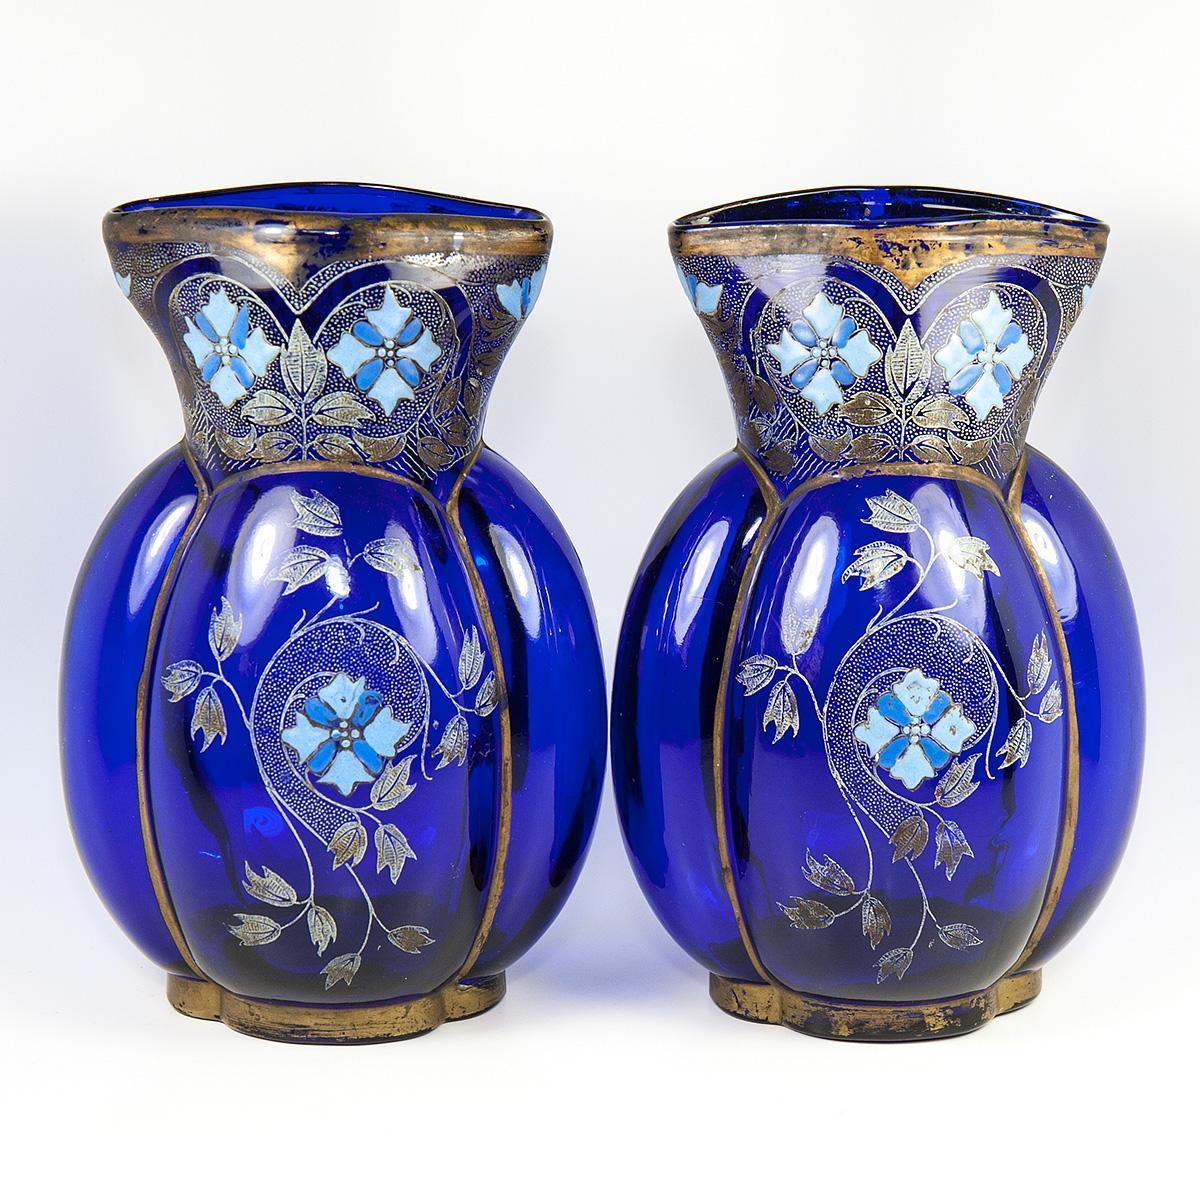 Bohemian Pair of Antique Hand Enameled Czech Art Glass Vases, Quatrefoil